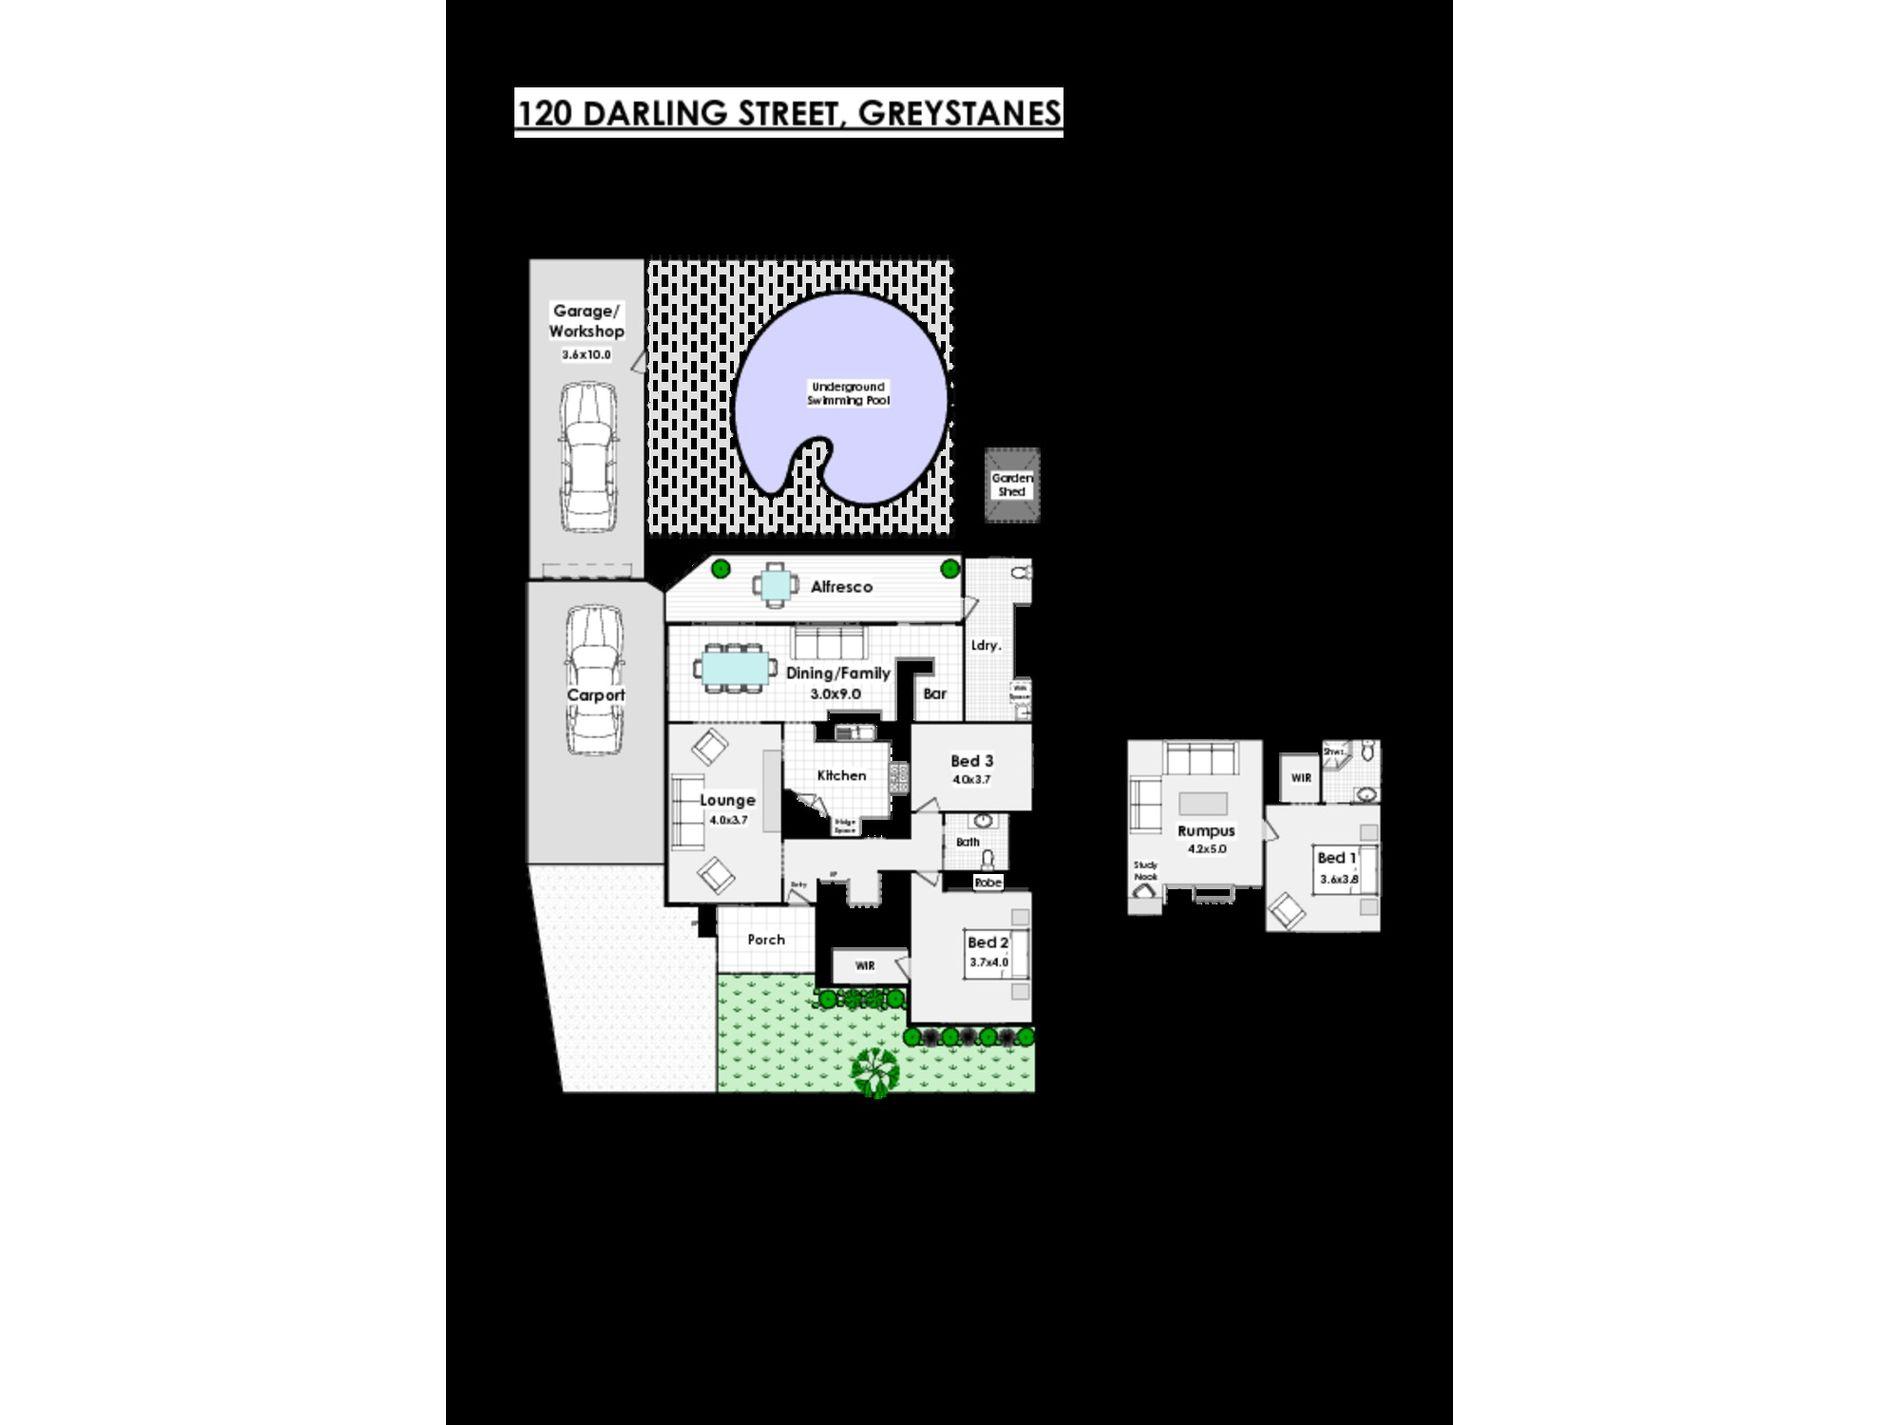 120 Darling Street, Greystanes